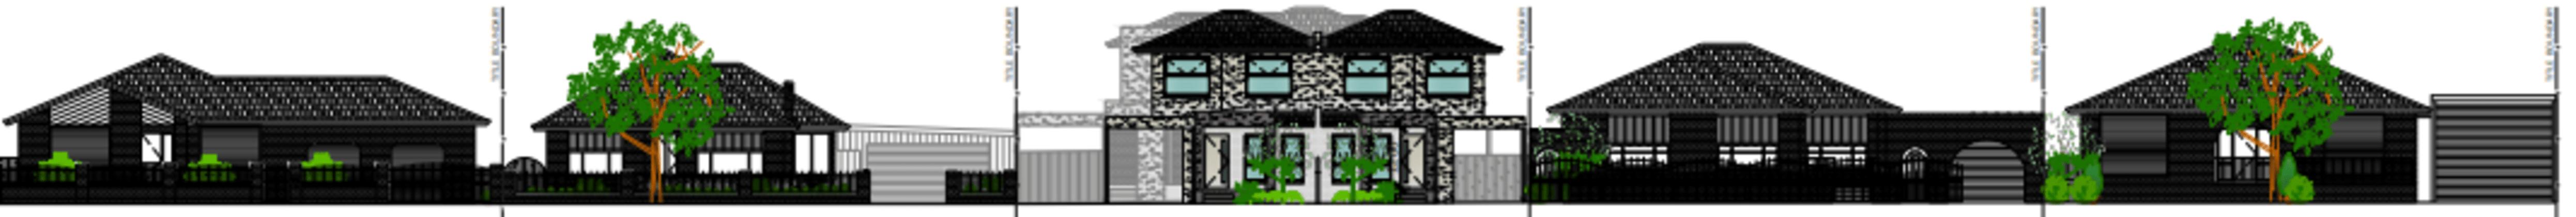 Planning Image: Custovic Design